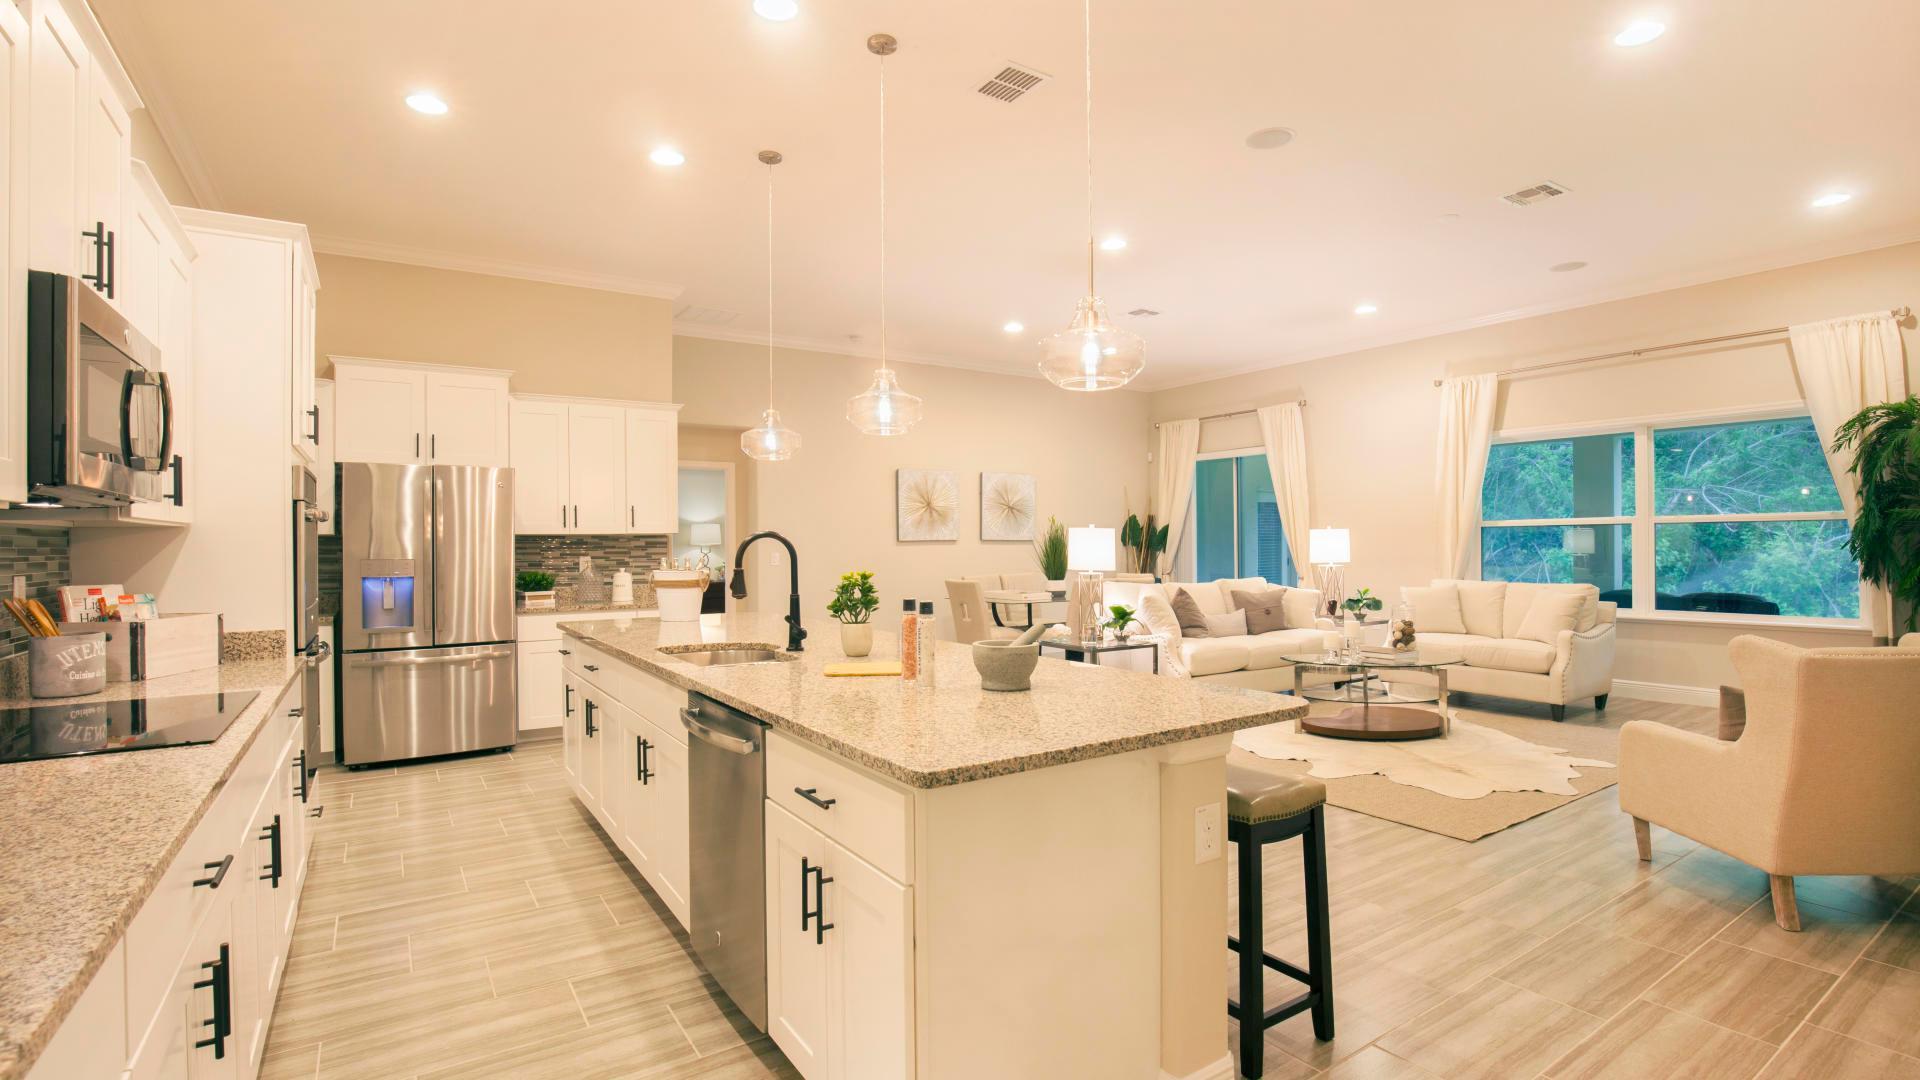 Kitchen featured in the Livorno By Maronda Homes in Daytona Beach, FL